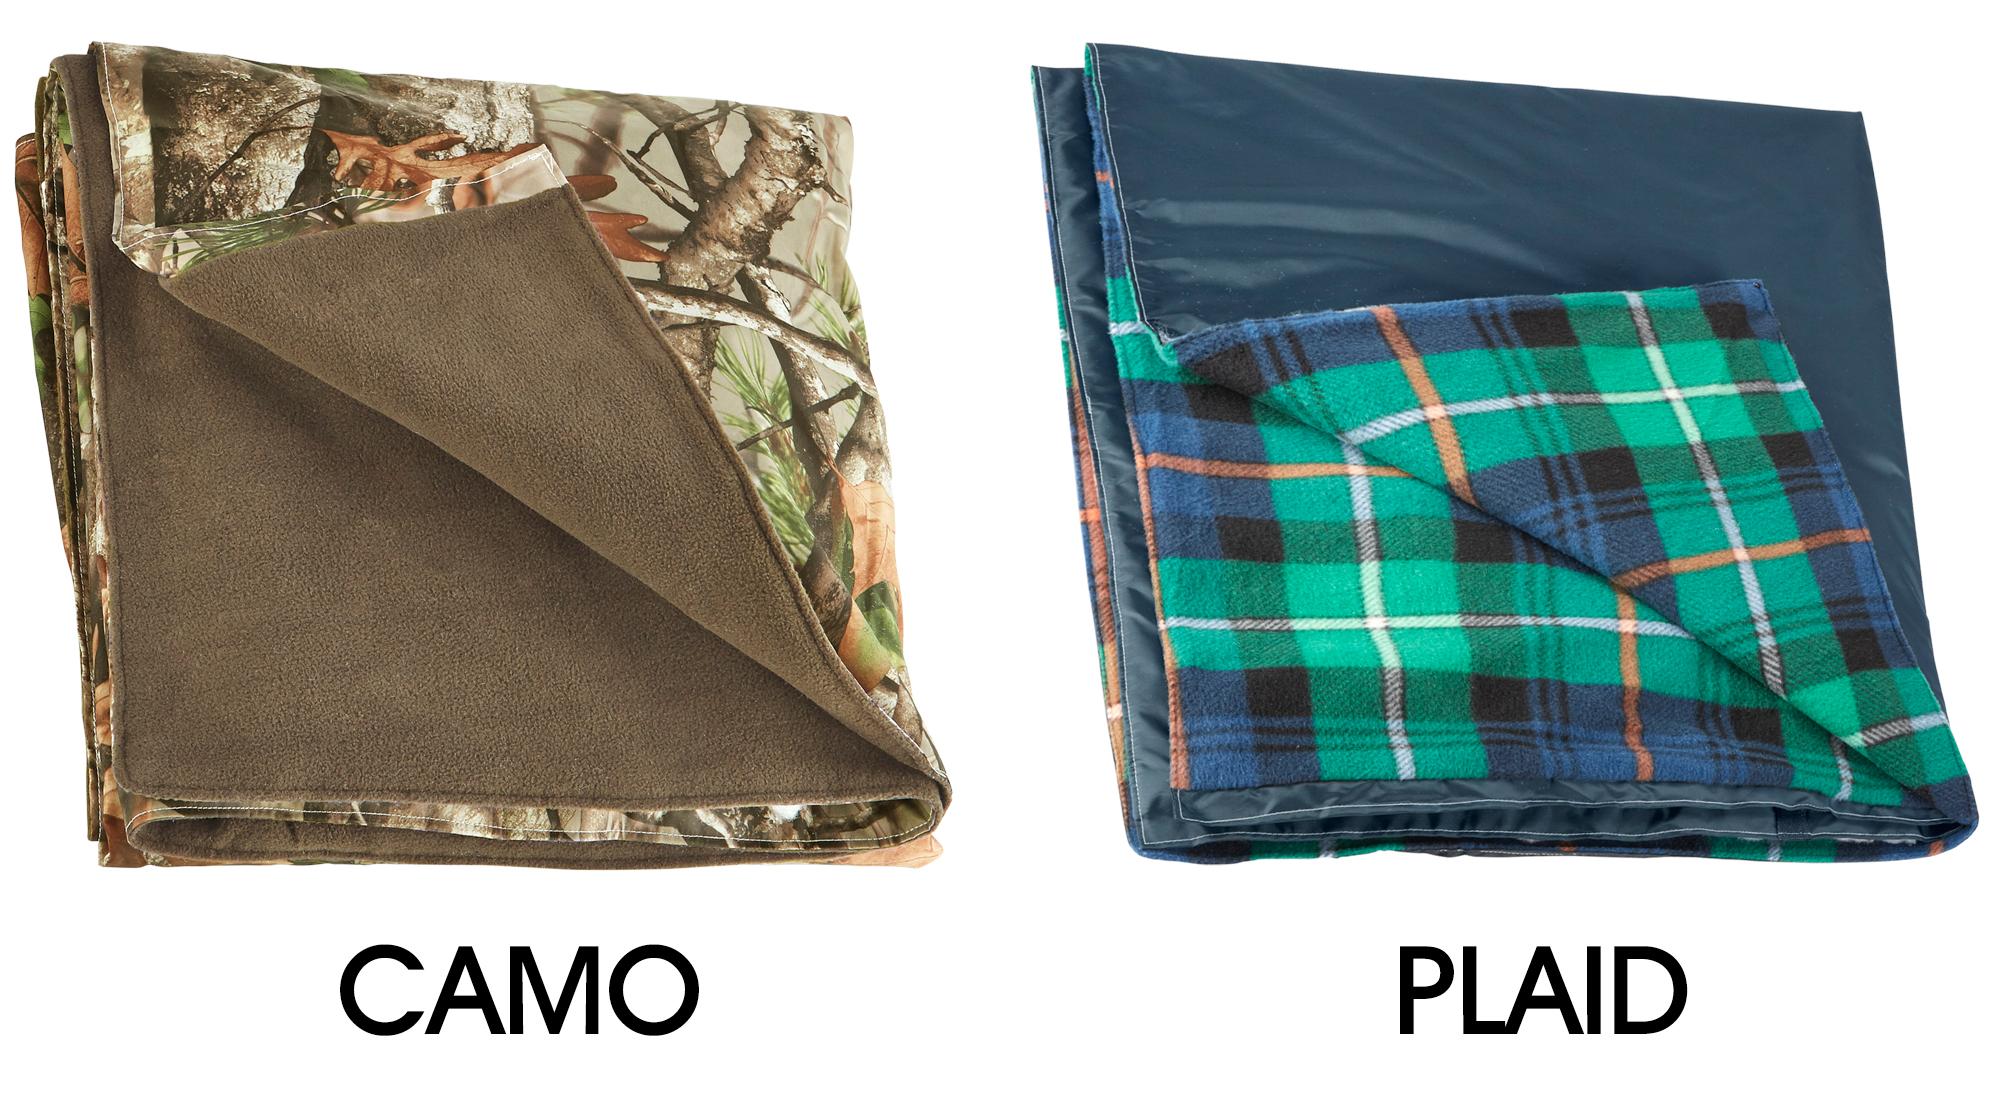 Camo Blanket In Stock Uline